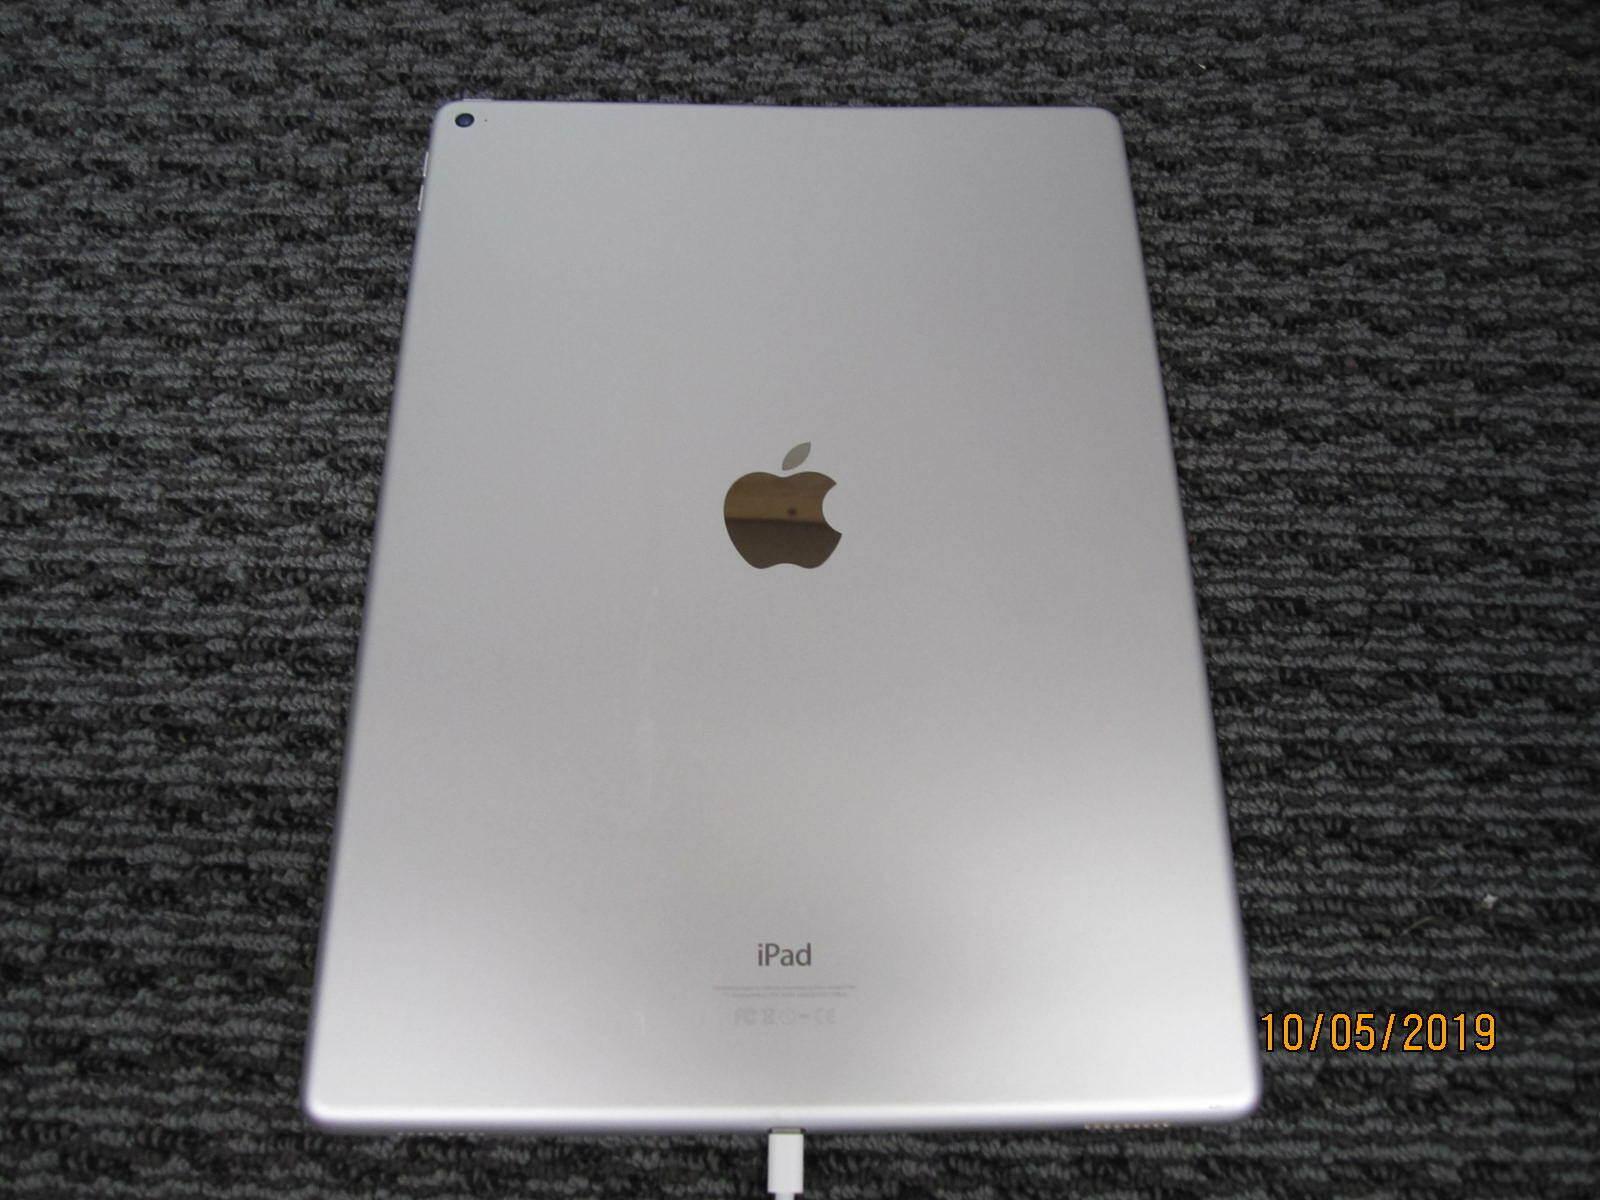 Apple iPad Pro 2nd Gen 12.9, Wi-Fi |64GB 256GB 512GBIGray Silver Gold | Grade C